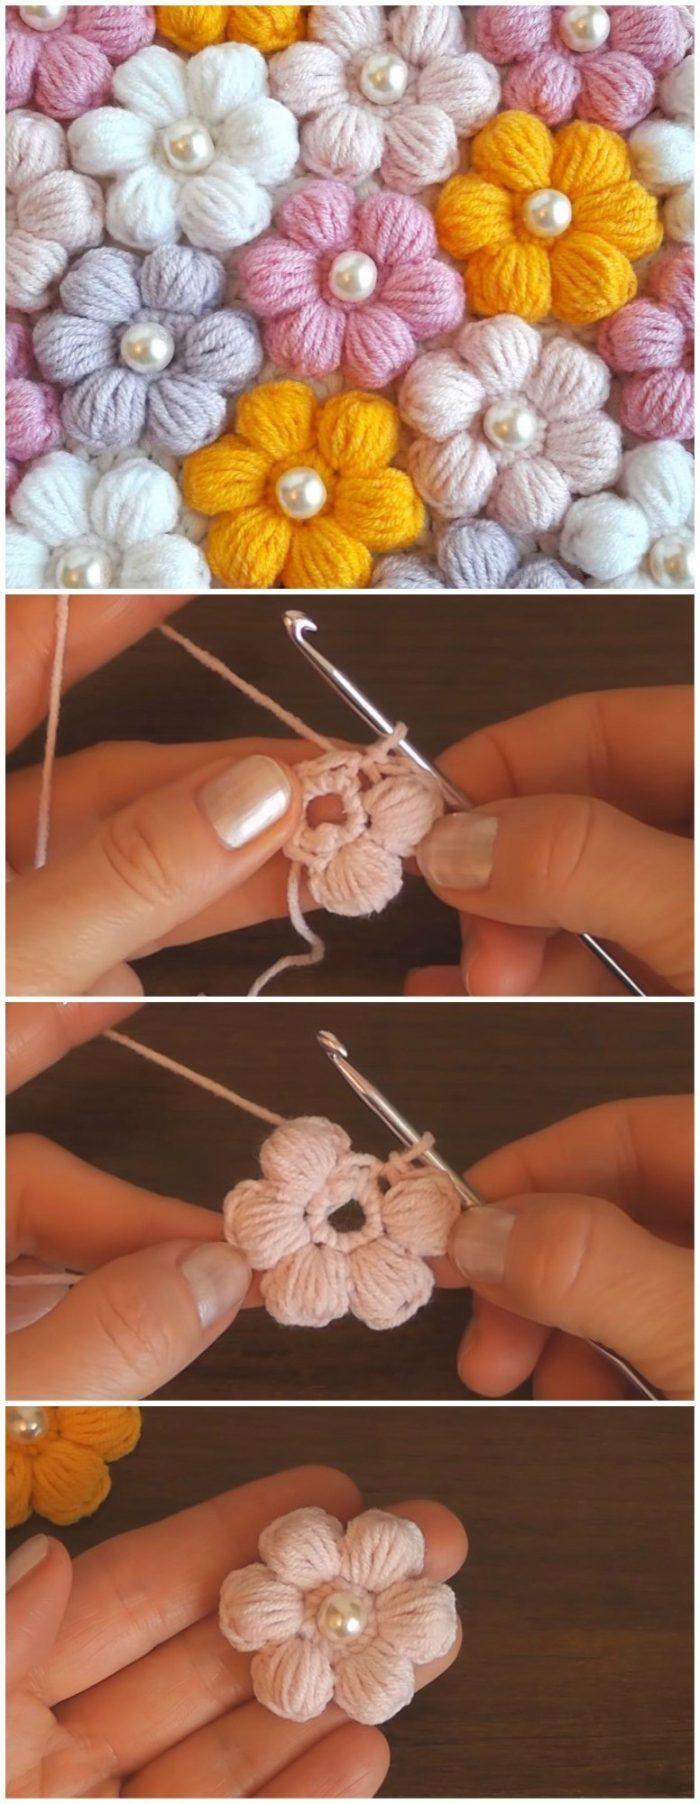 Crochet 3D Puff Flower #crochetflowers